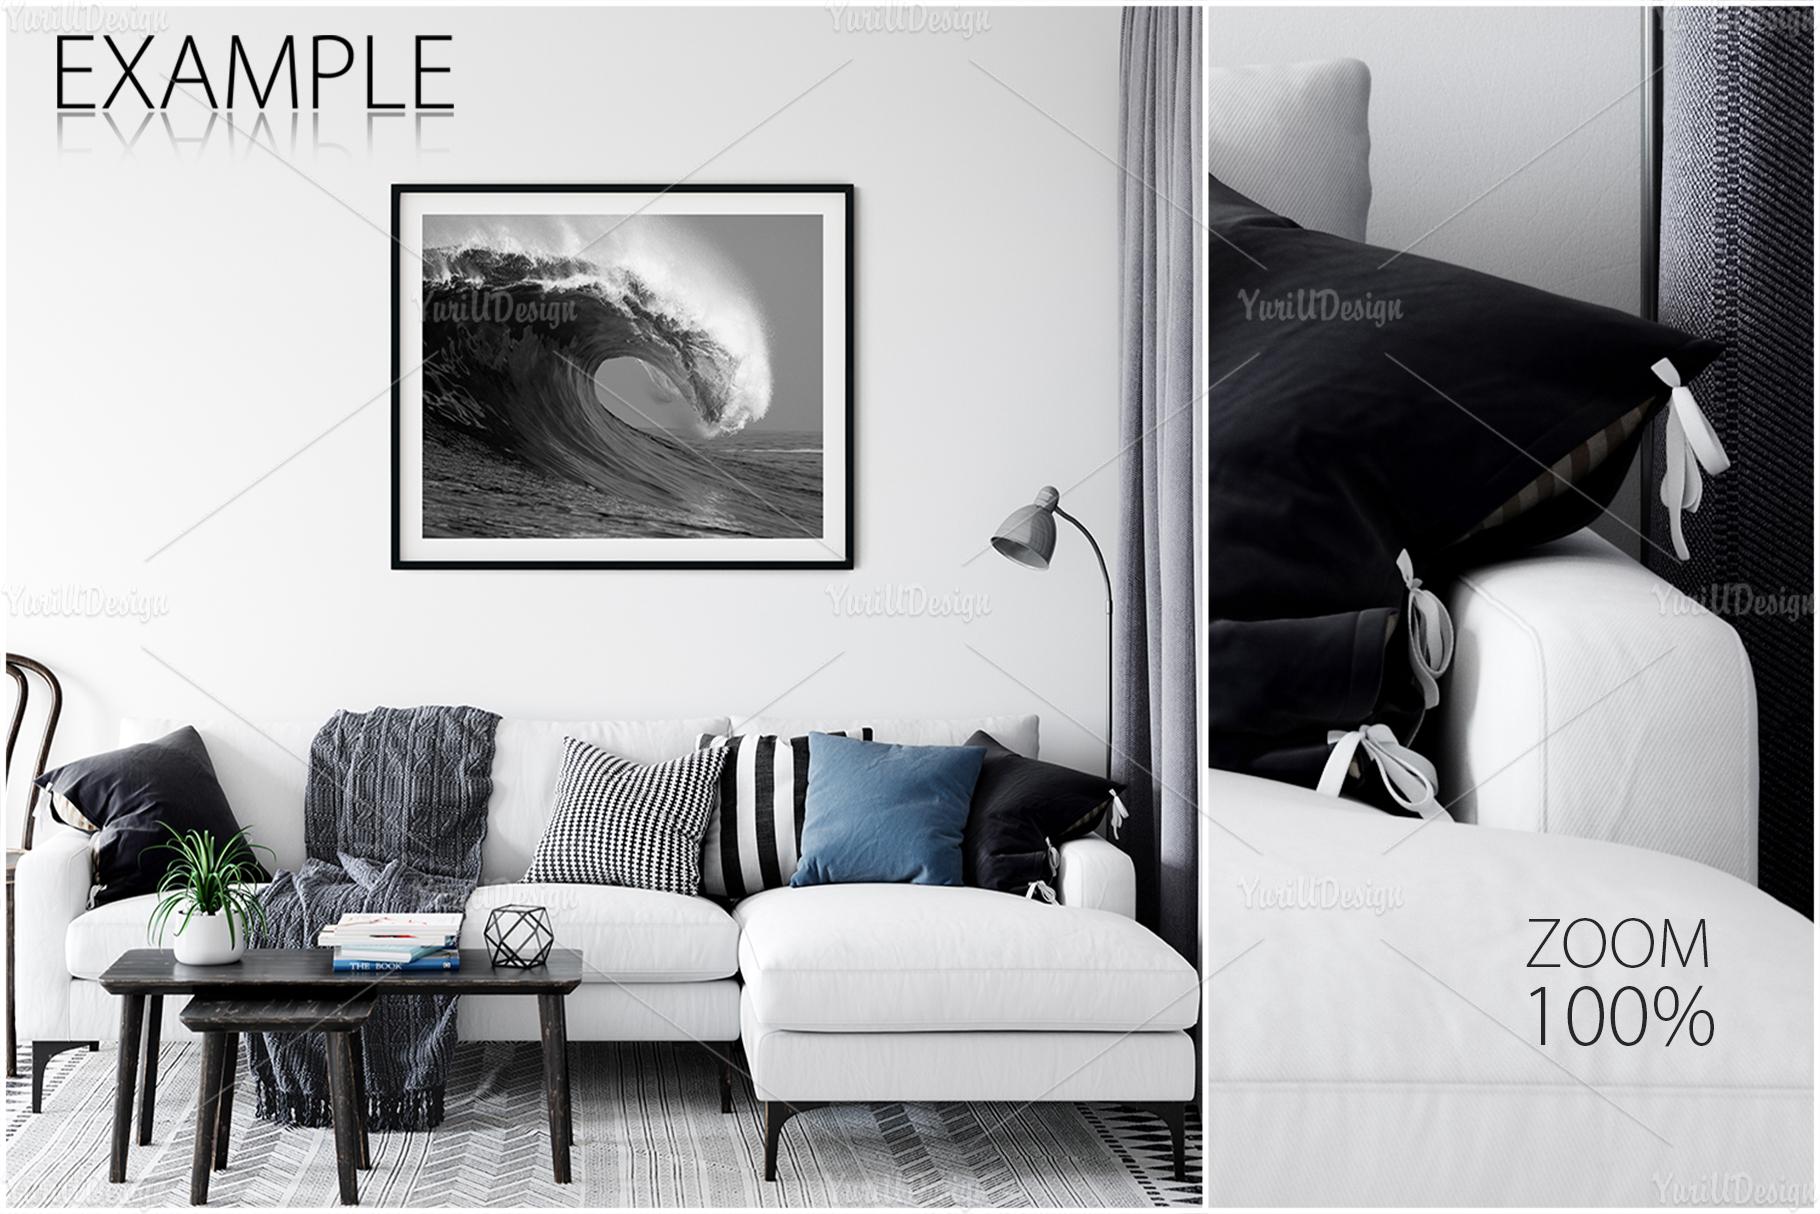 Scandinavian Interior Frames & Walls Mockup Bundle - 3 example image 21